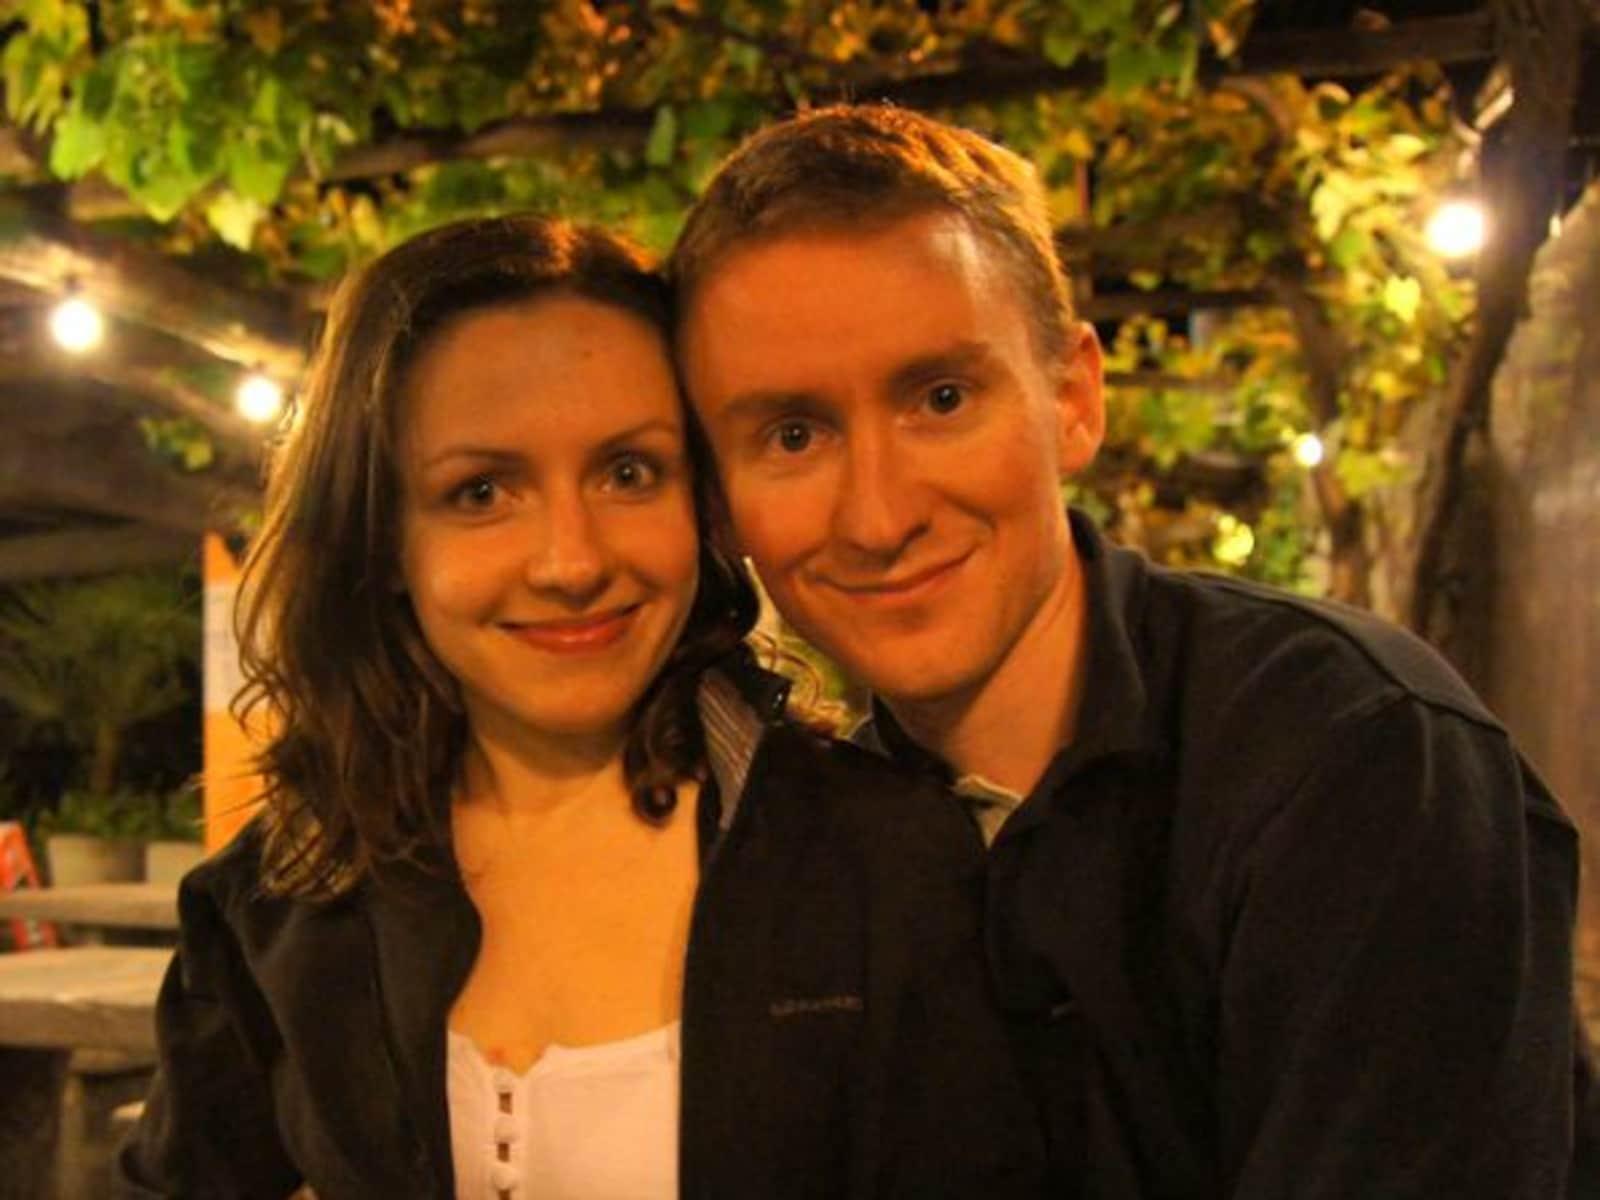 Richard & Aneta from Limassol, Cyprus